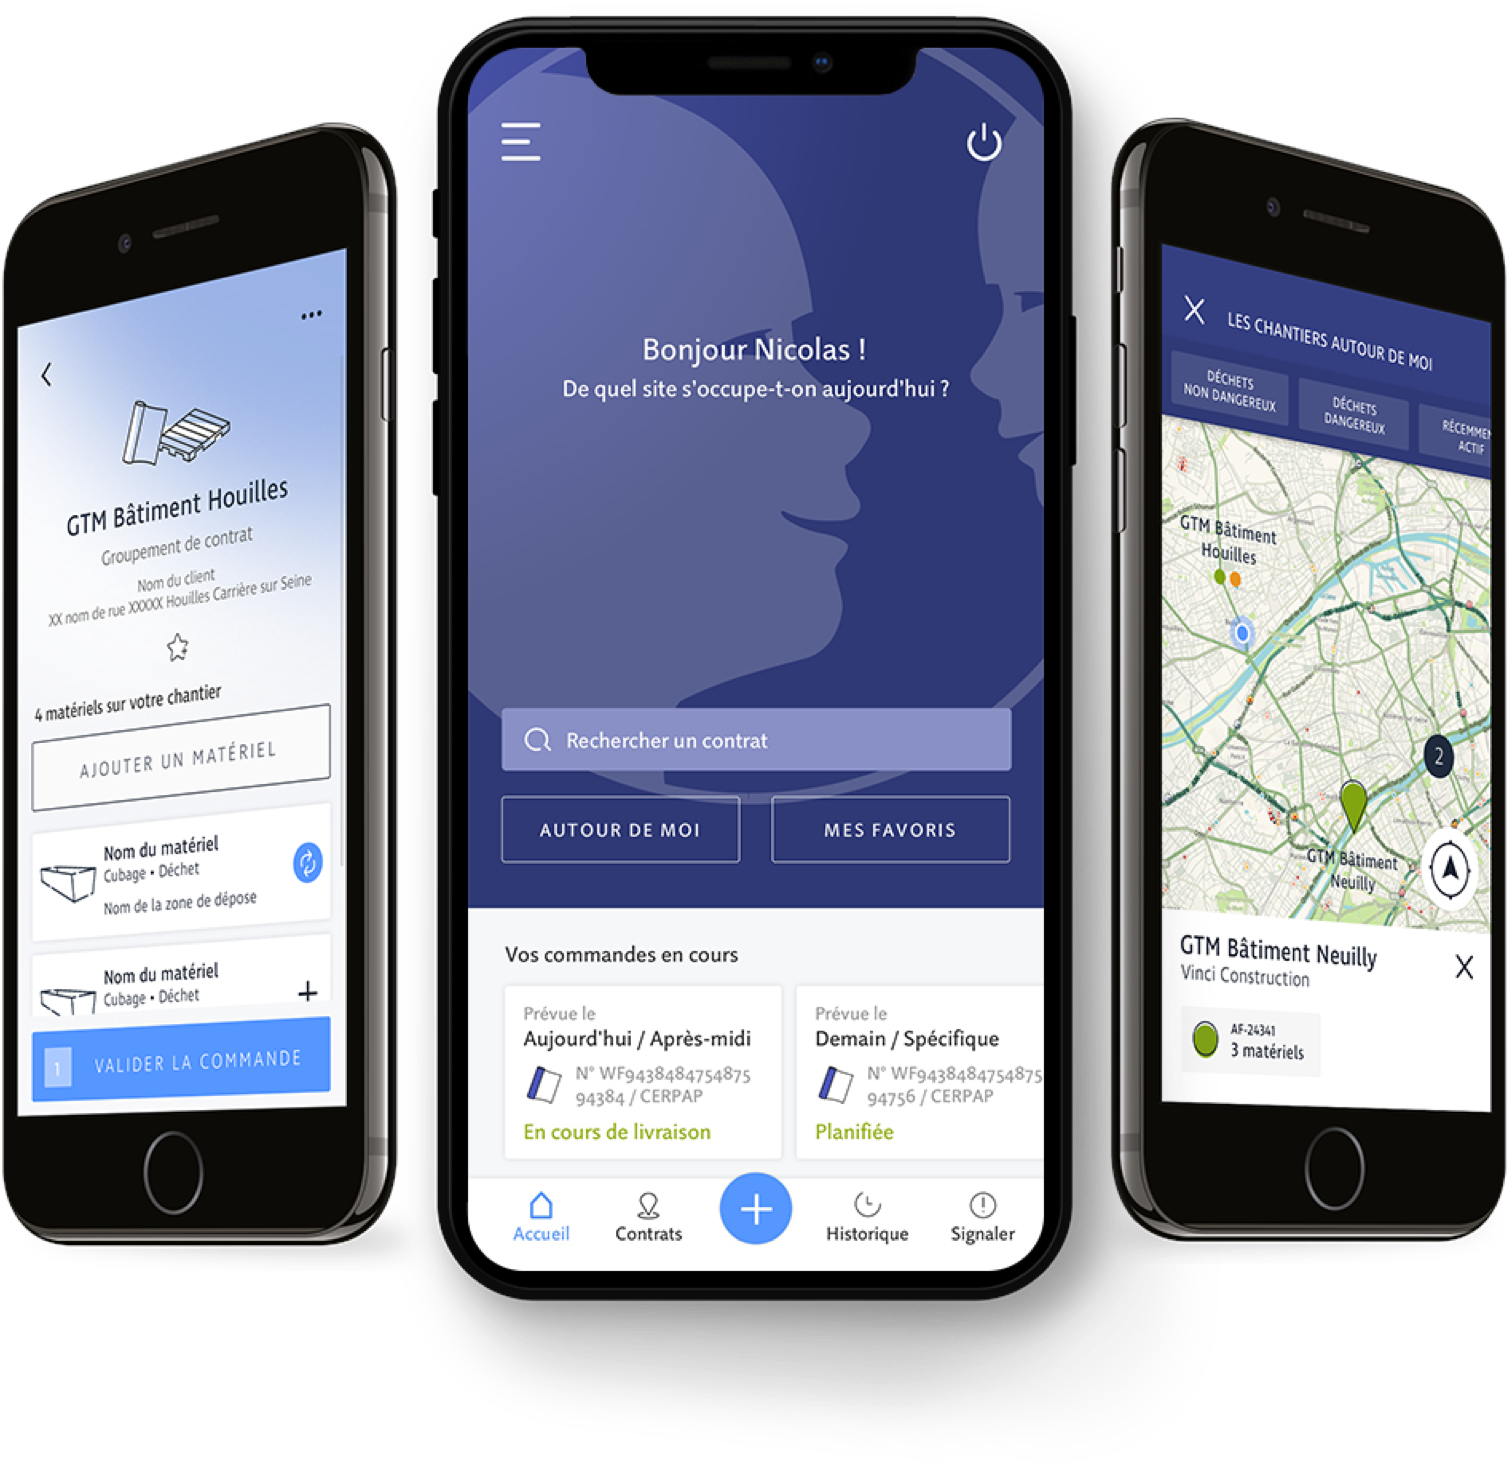 Présentation de trois smartphones avec l'application Paprec&Click